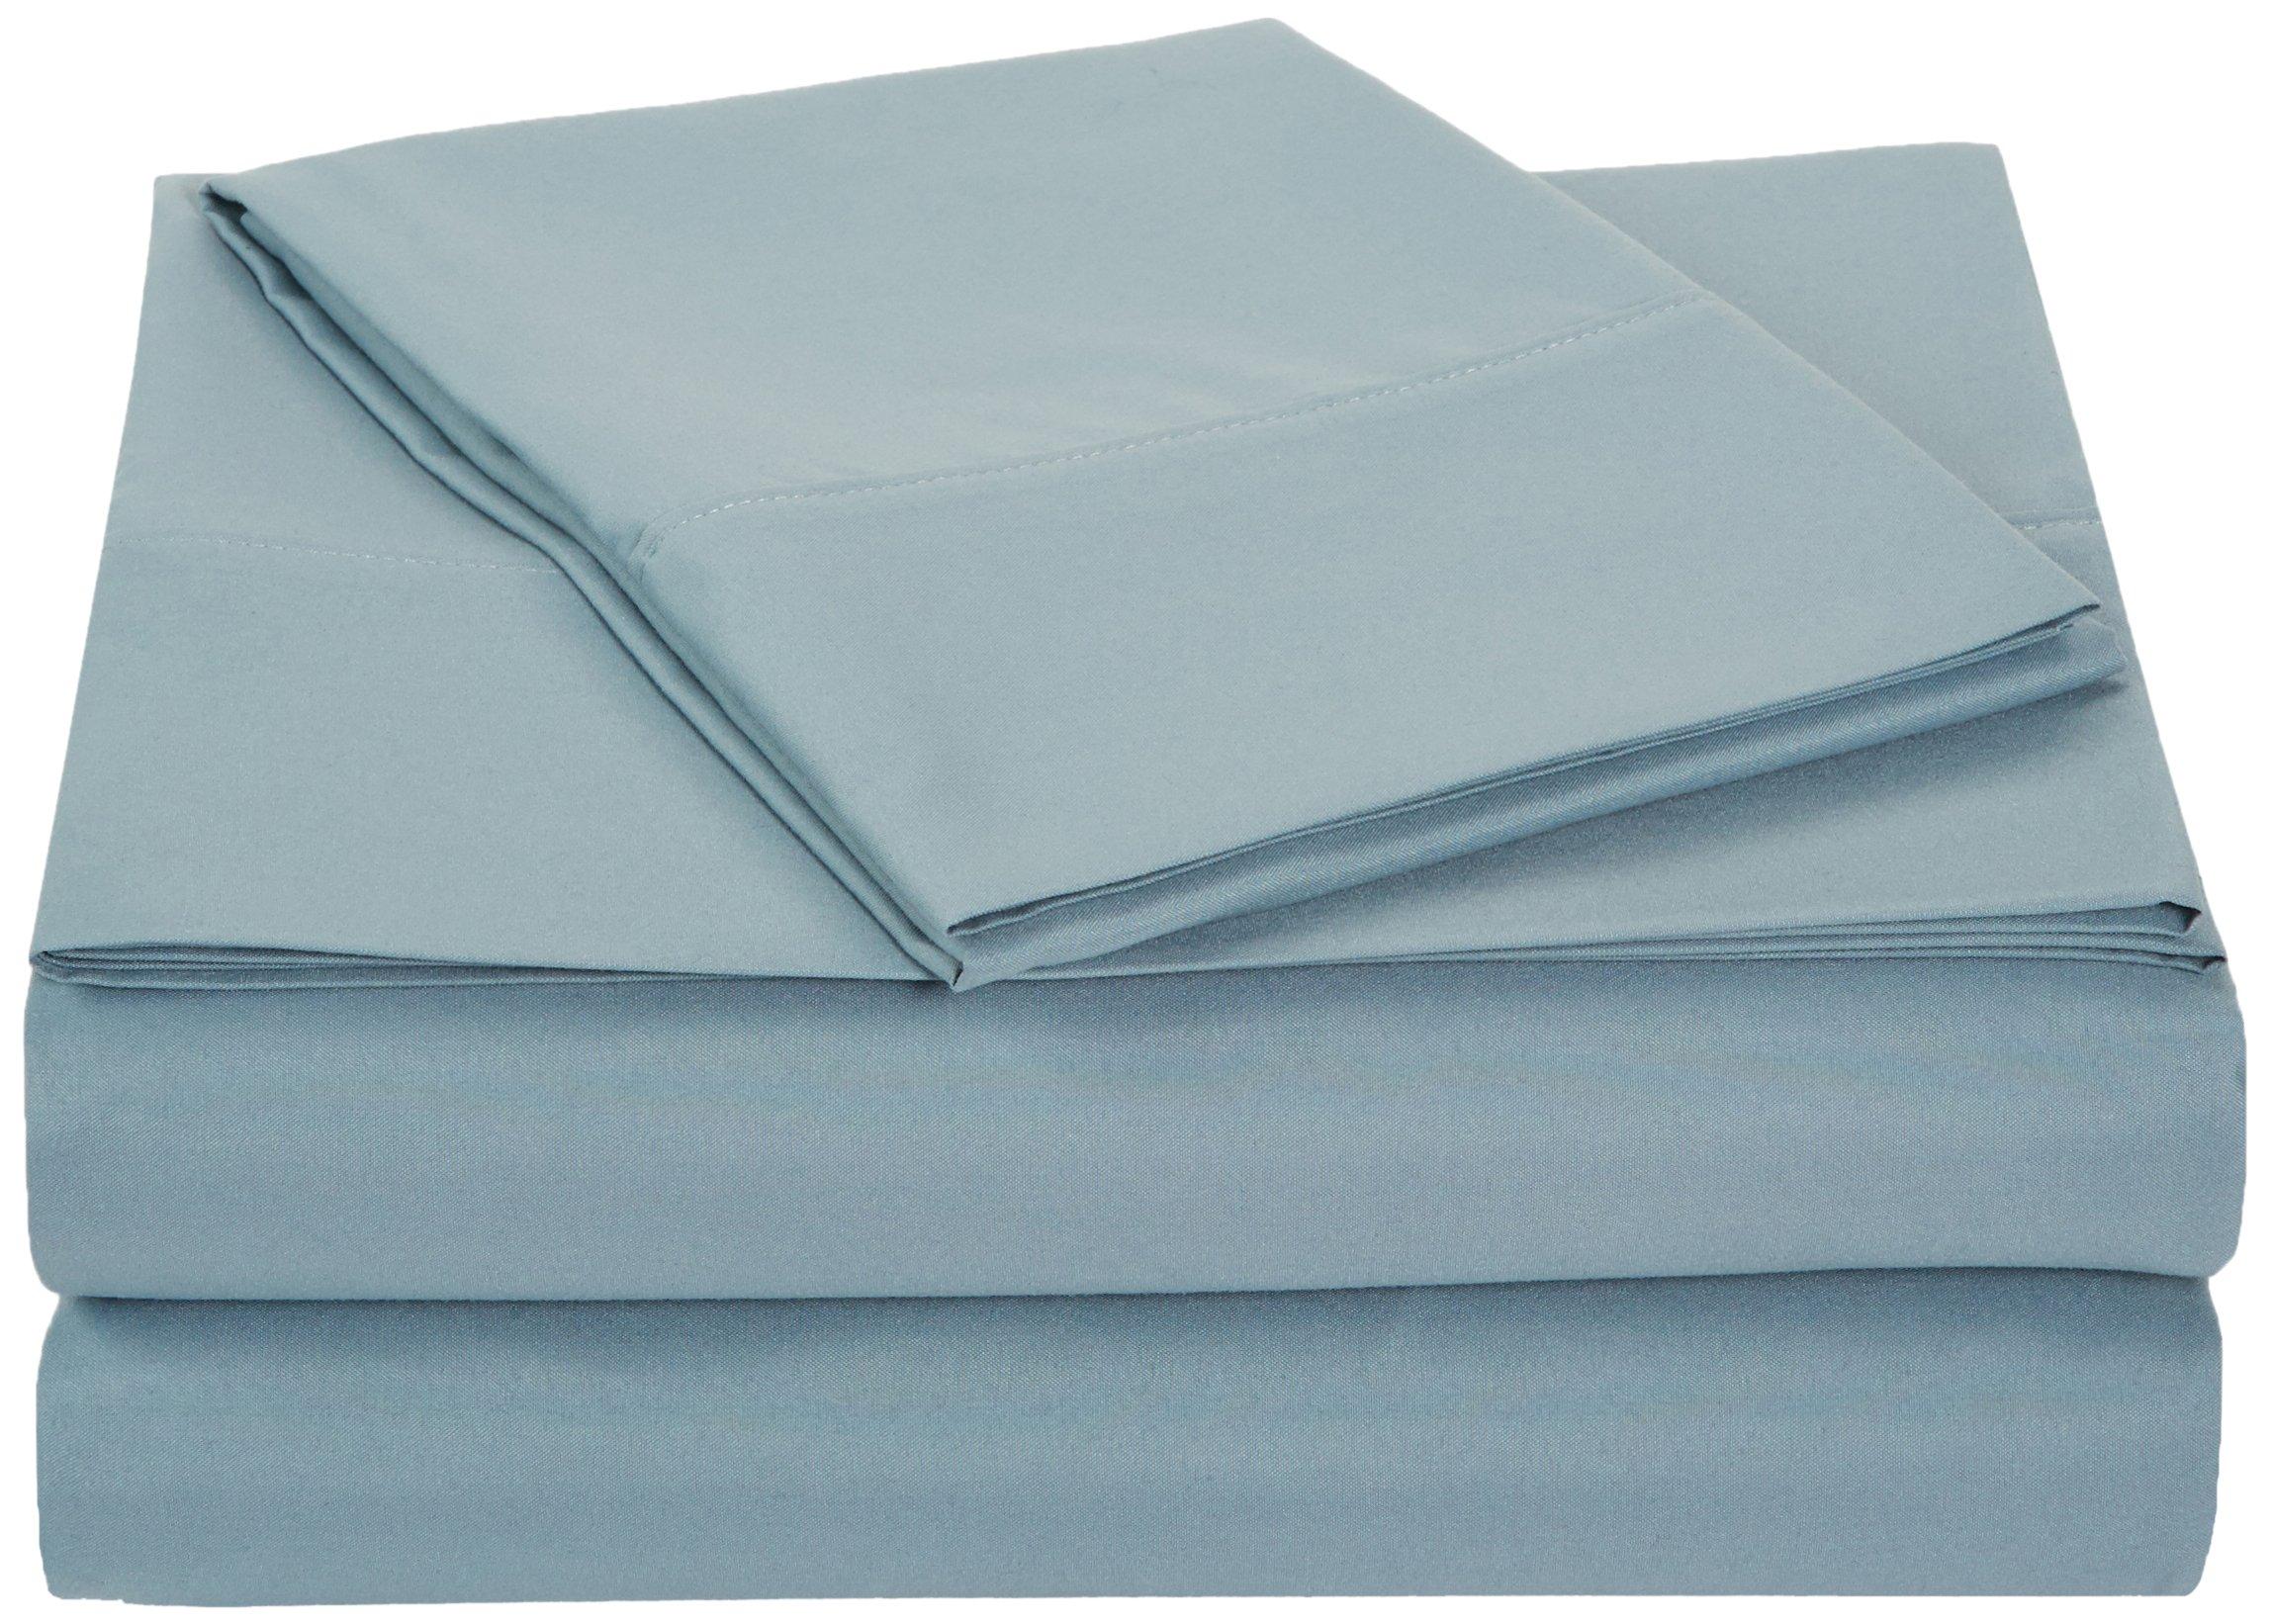 AmazonBasics Microfiber Sheet Set - Twin, Spa Blue